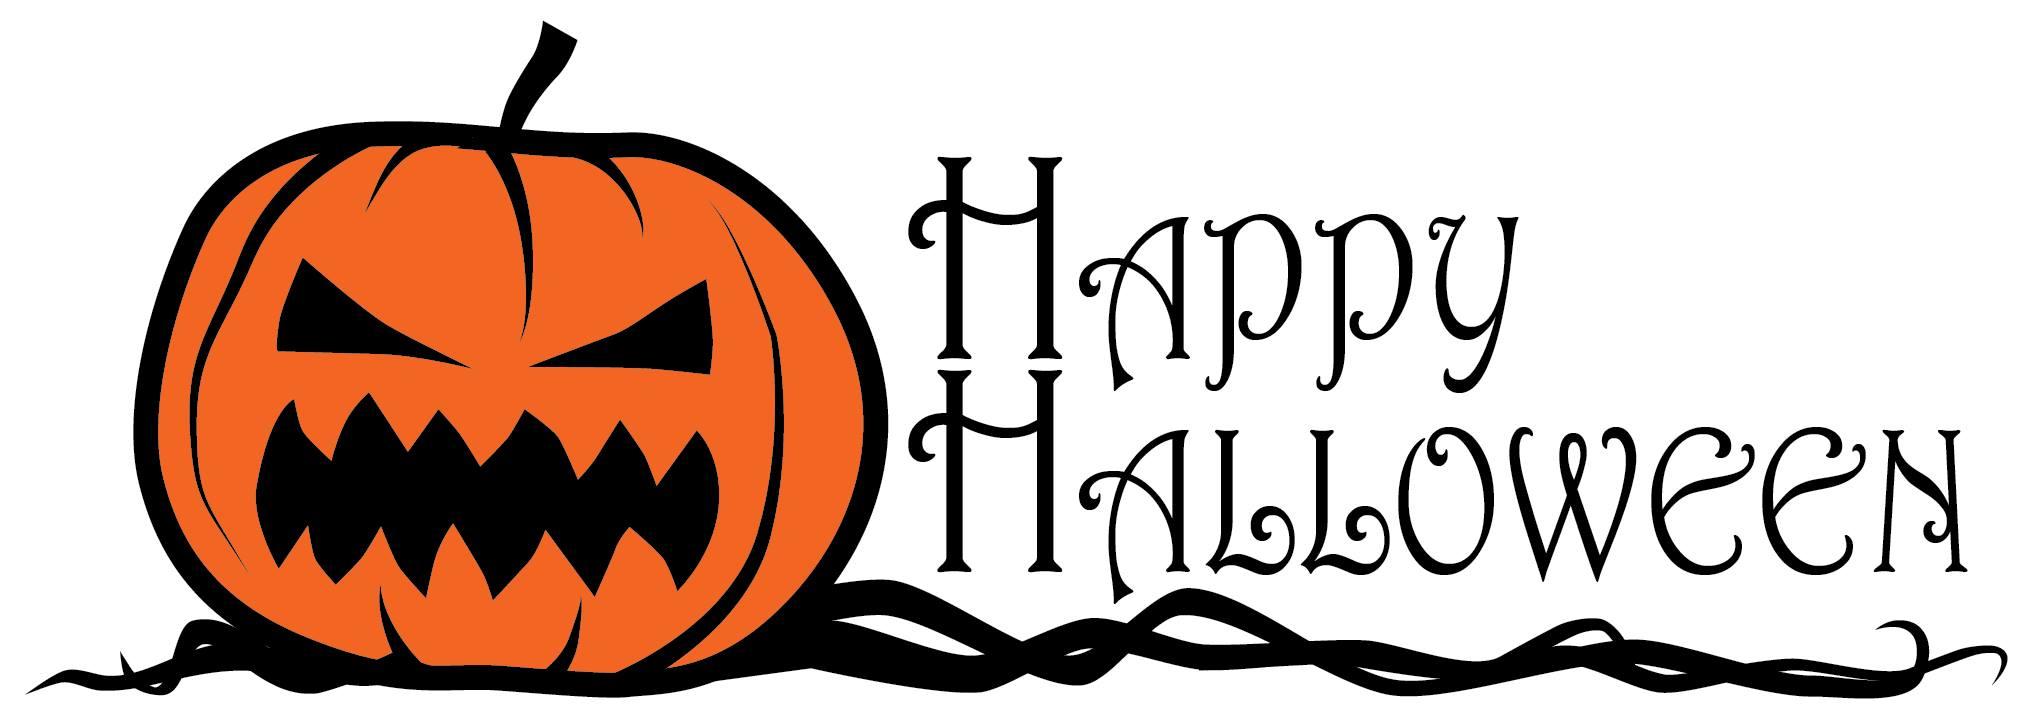 03 Banner halloween